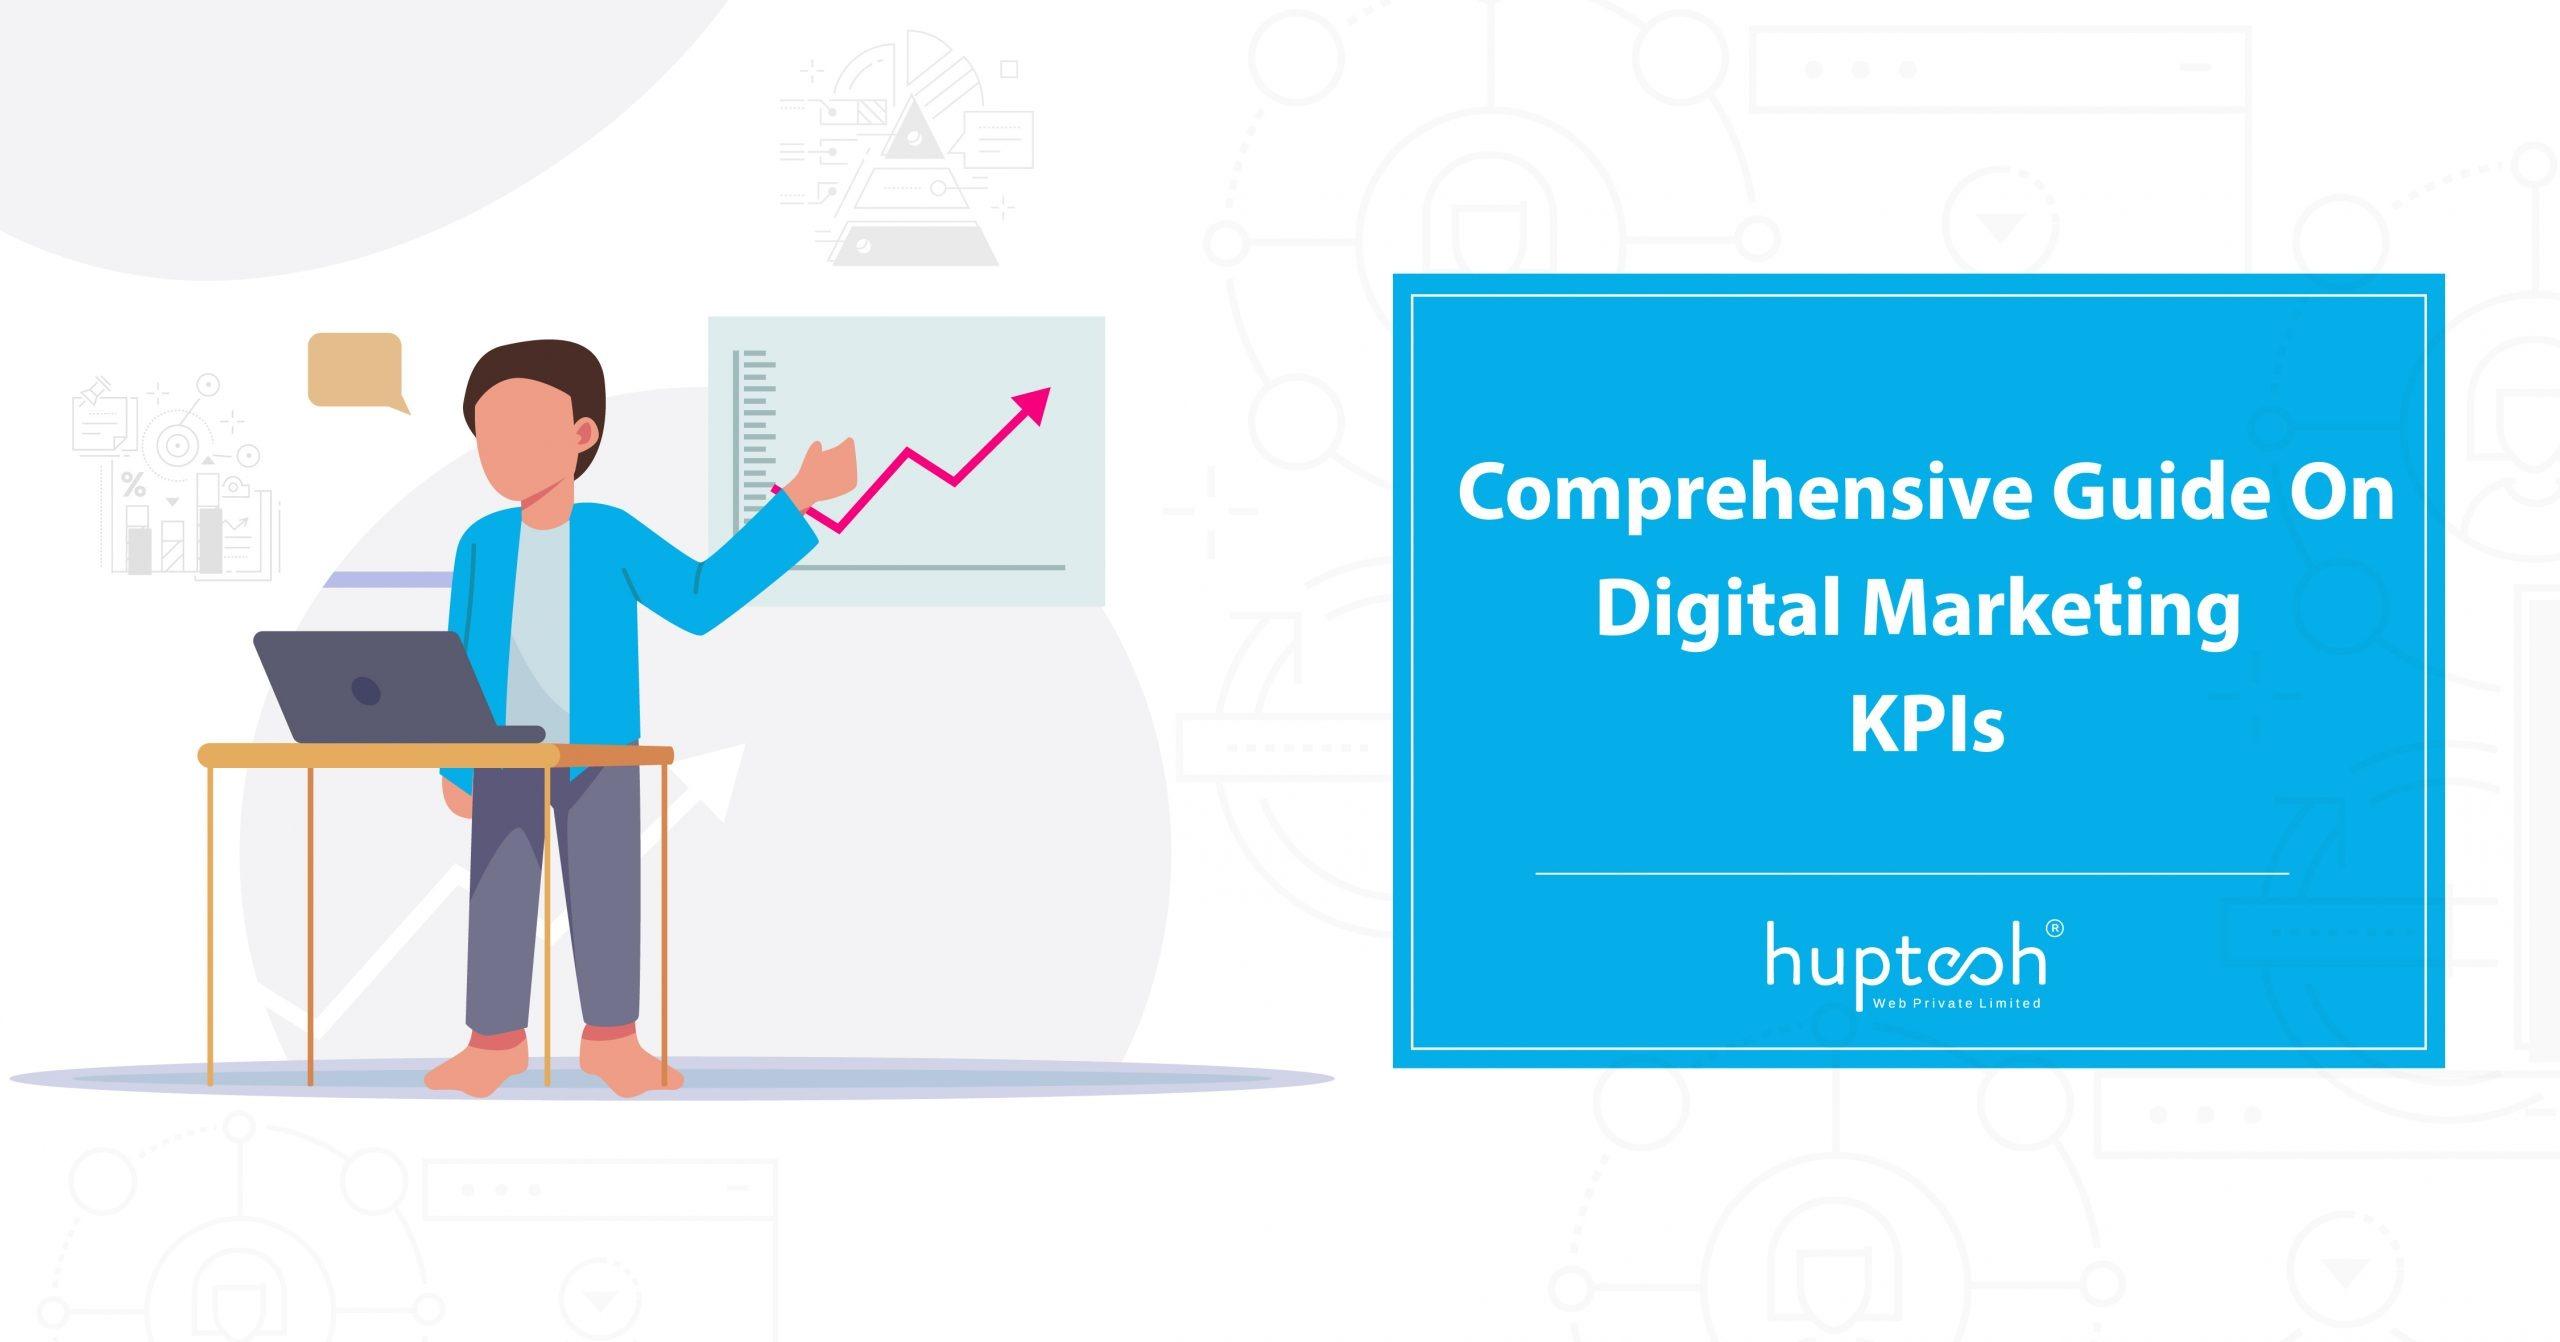 digital marketing kpis 2021